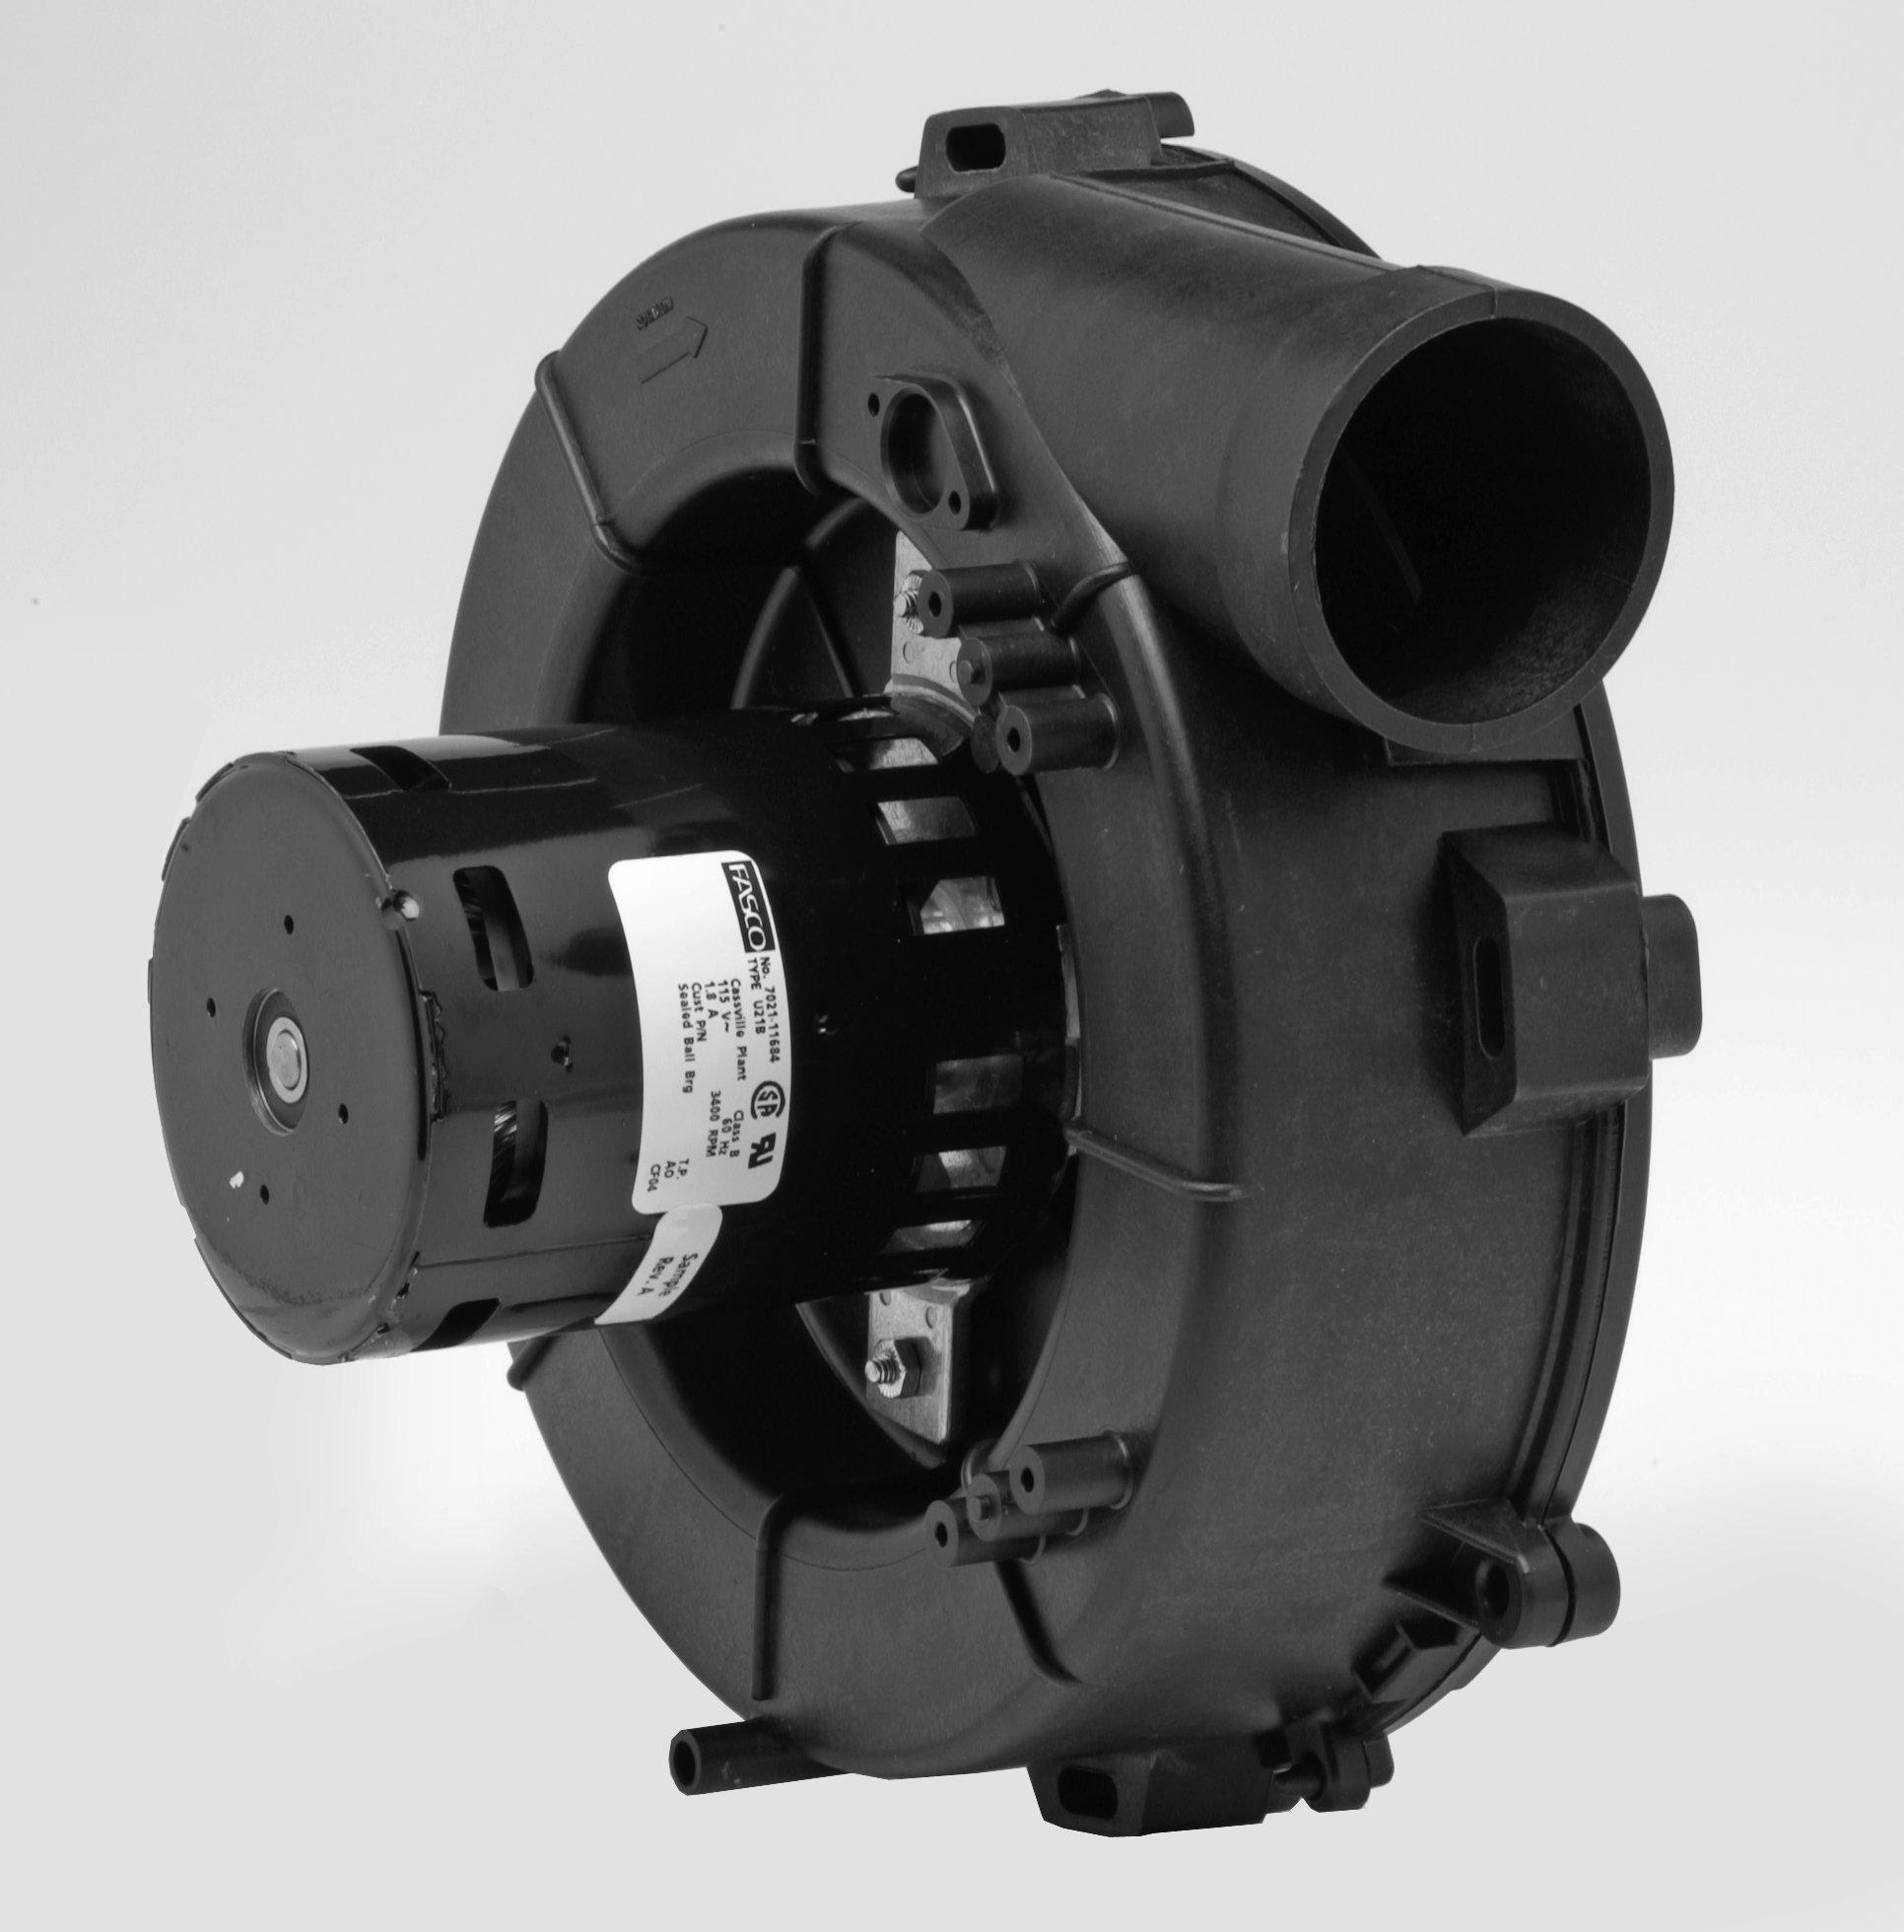 Fasco A204 Specific Purpose Blowers, Lennox 7021-11406, 83L4101